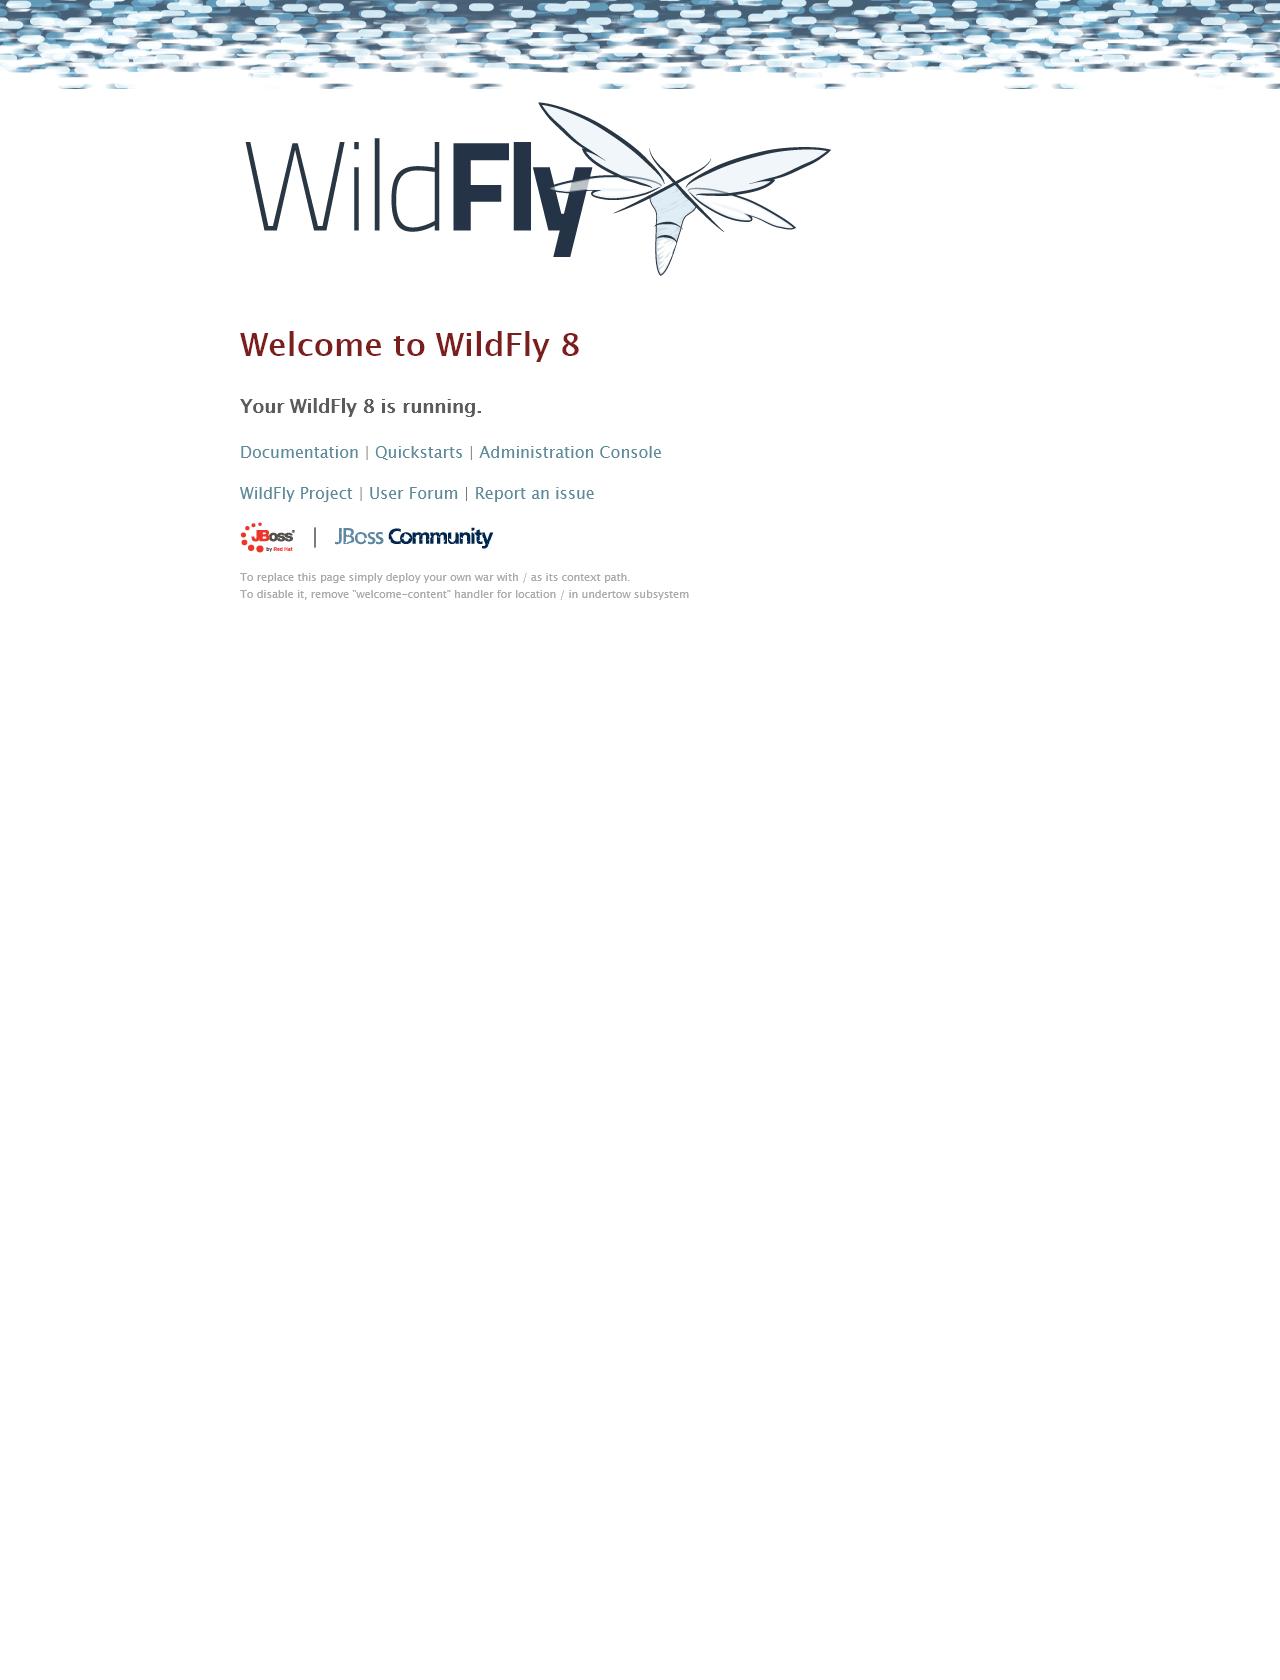 Screenshot Desktop - https://seatrans.dataloy.com/